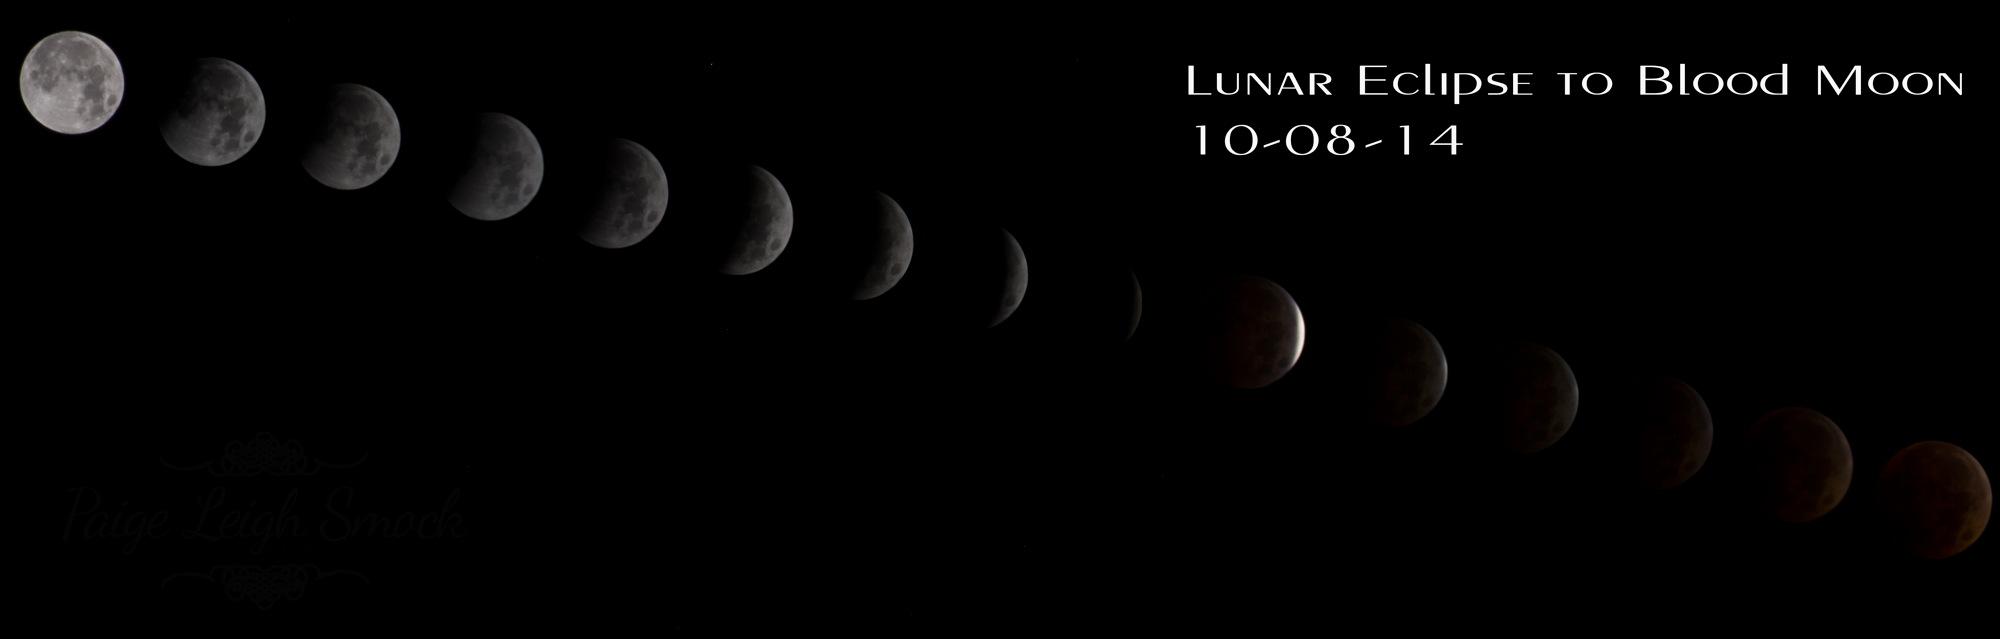 Lunar Eclipse Composite Image